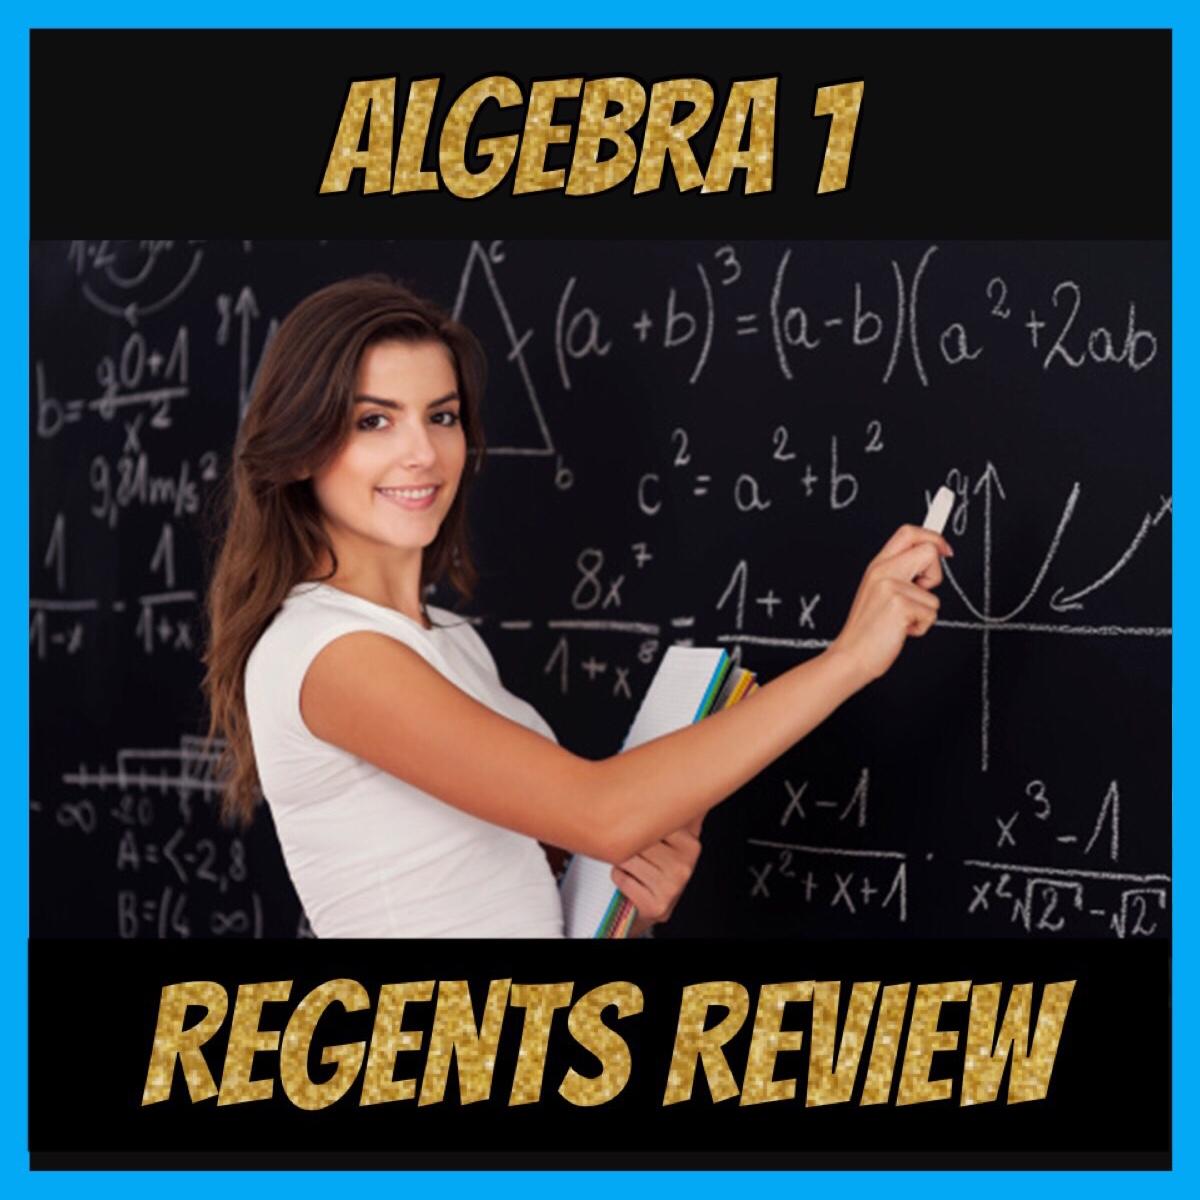 Algebra 1 Regents Review Classes - Study with a Teacher Night - Precision  Test Prep